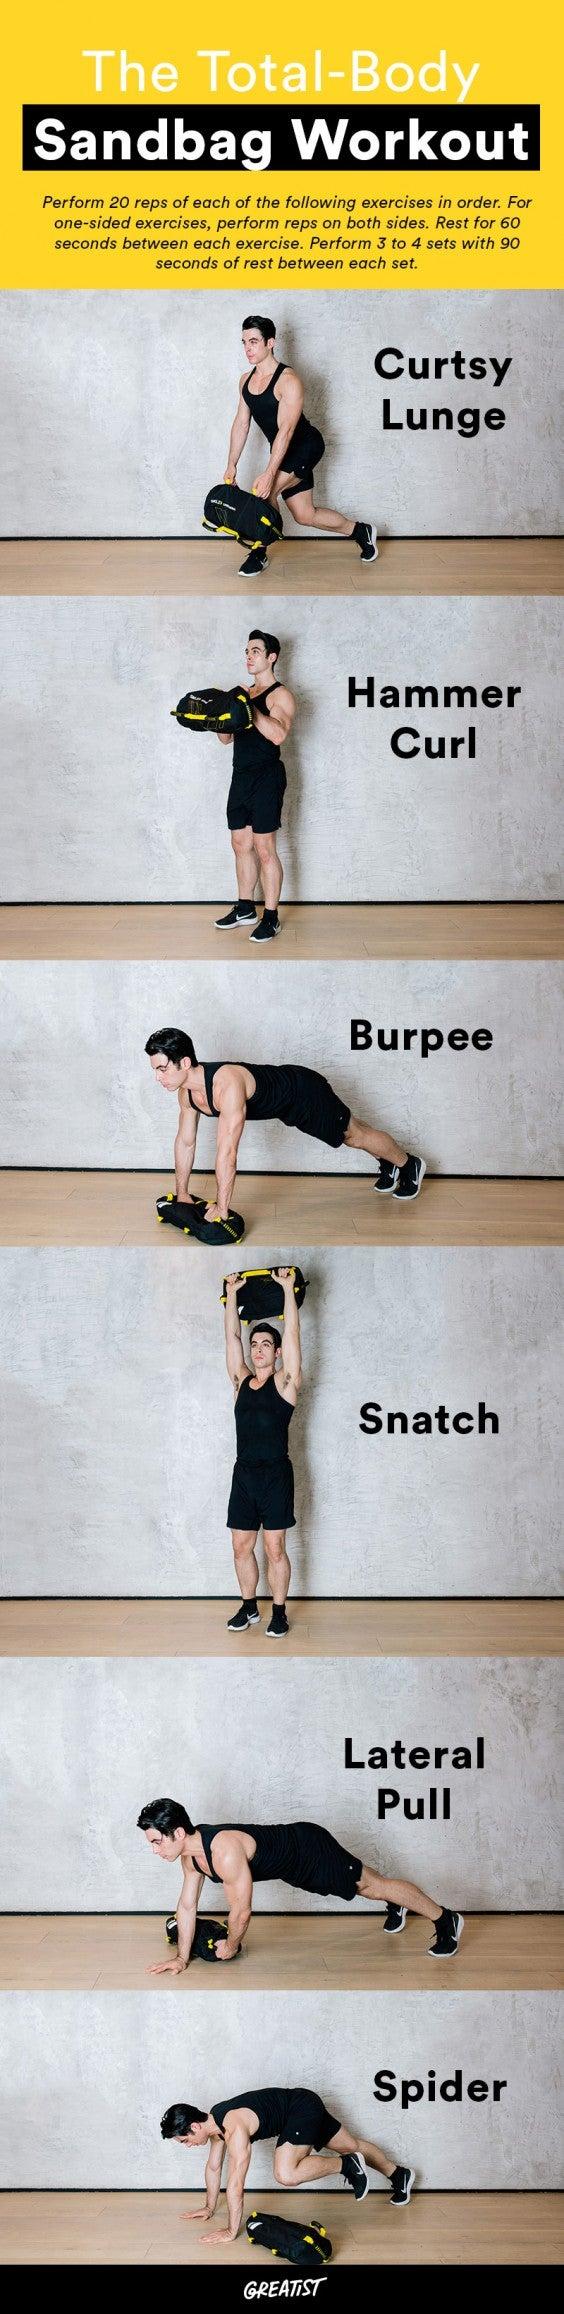 Compound Exercises 12 Sandbag Moves For Strength